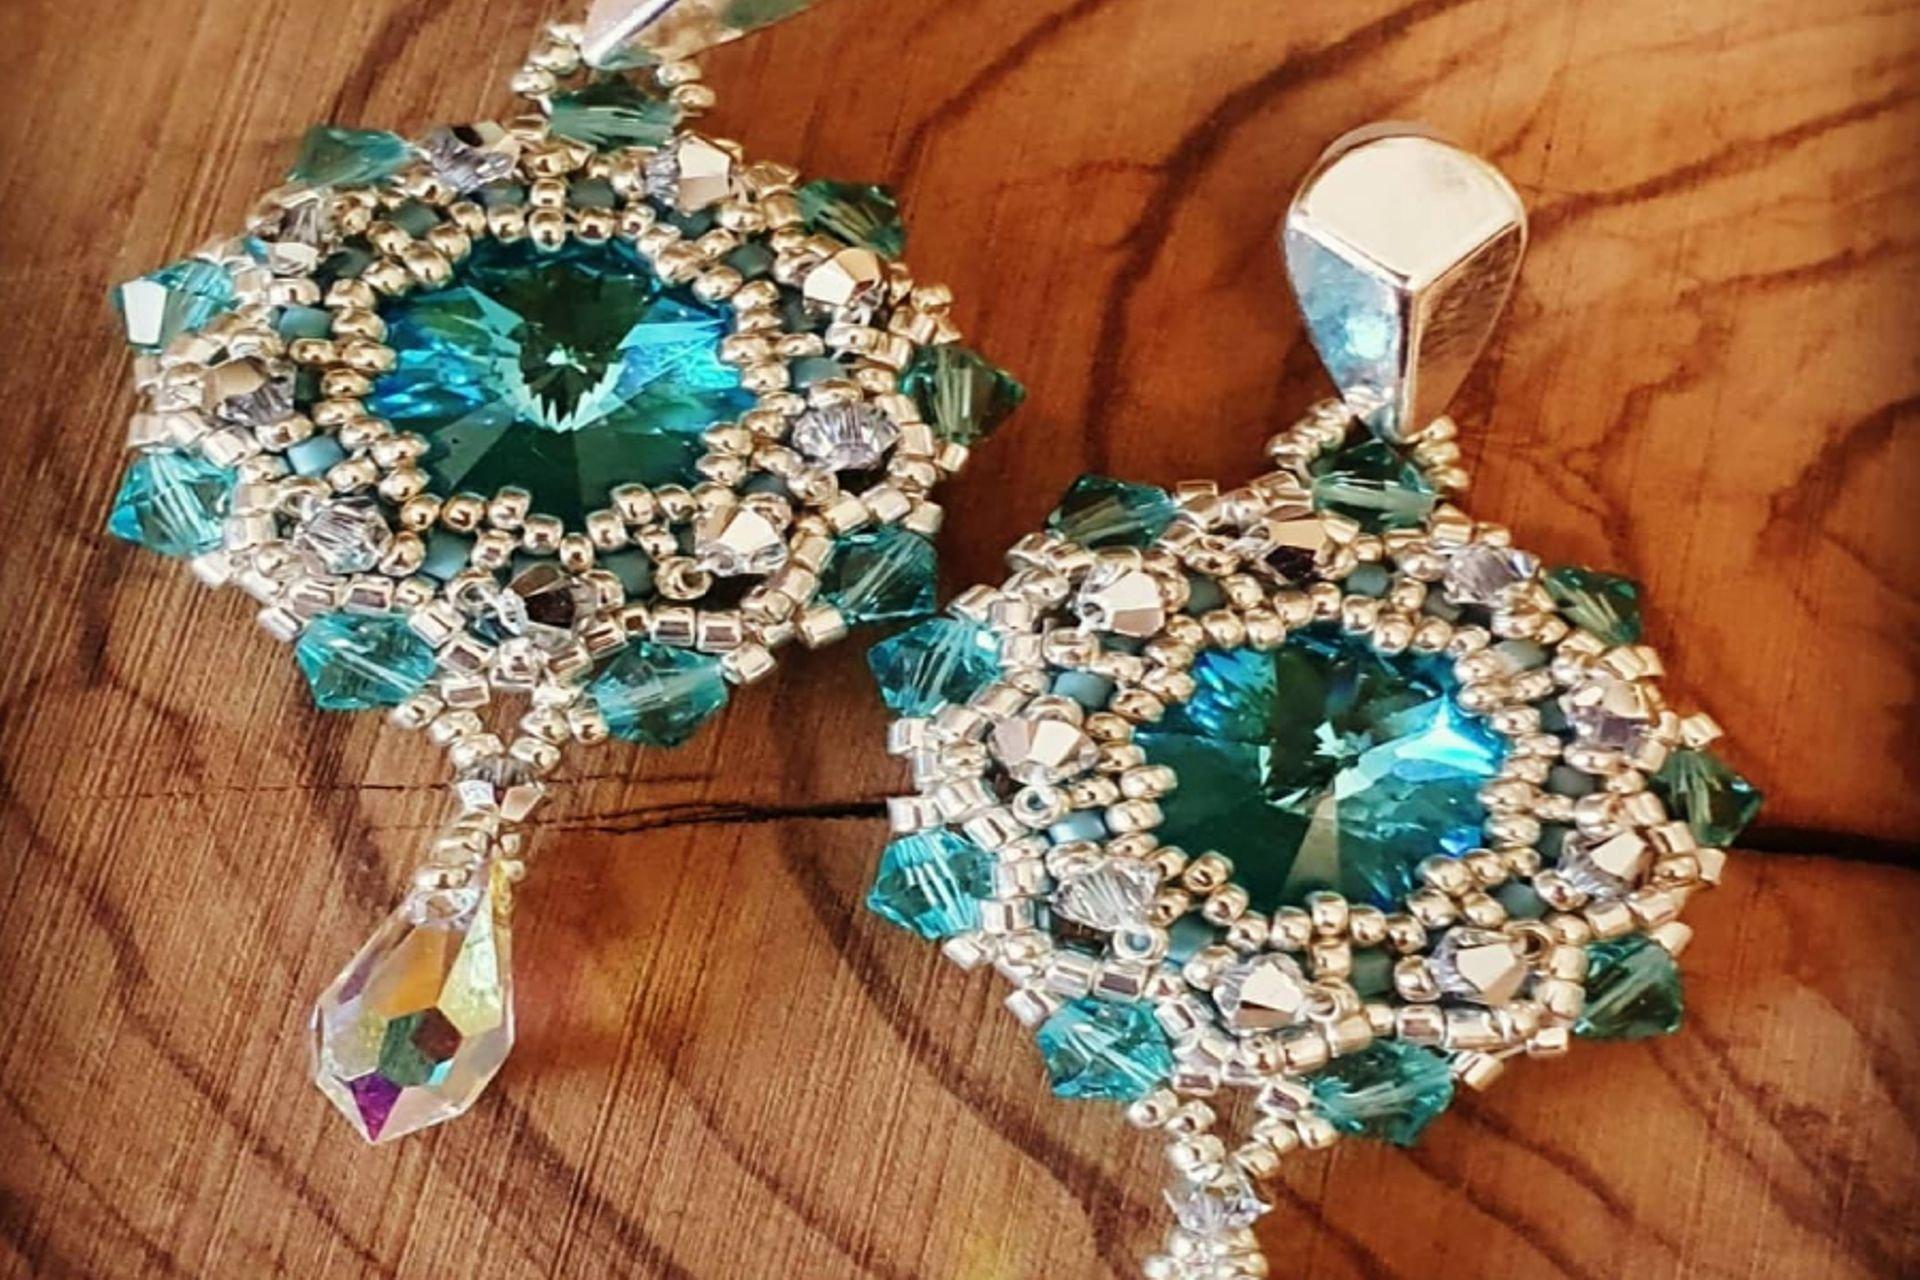 23 lantana beads jewelry designer תְמוּנָה